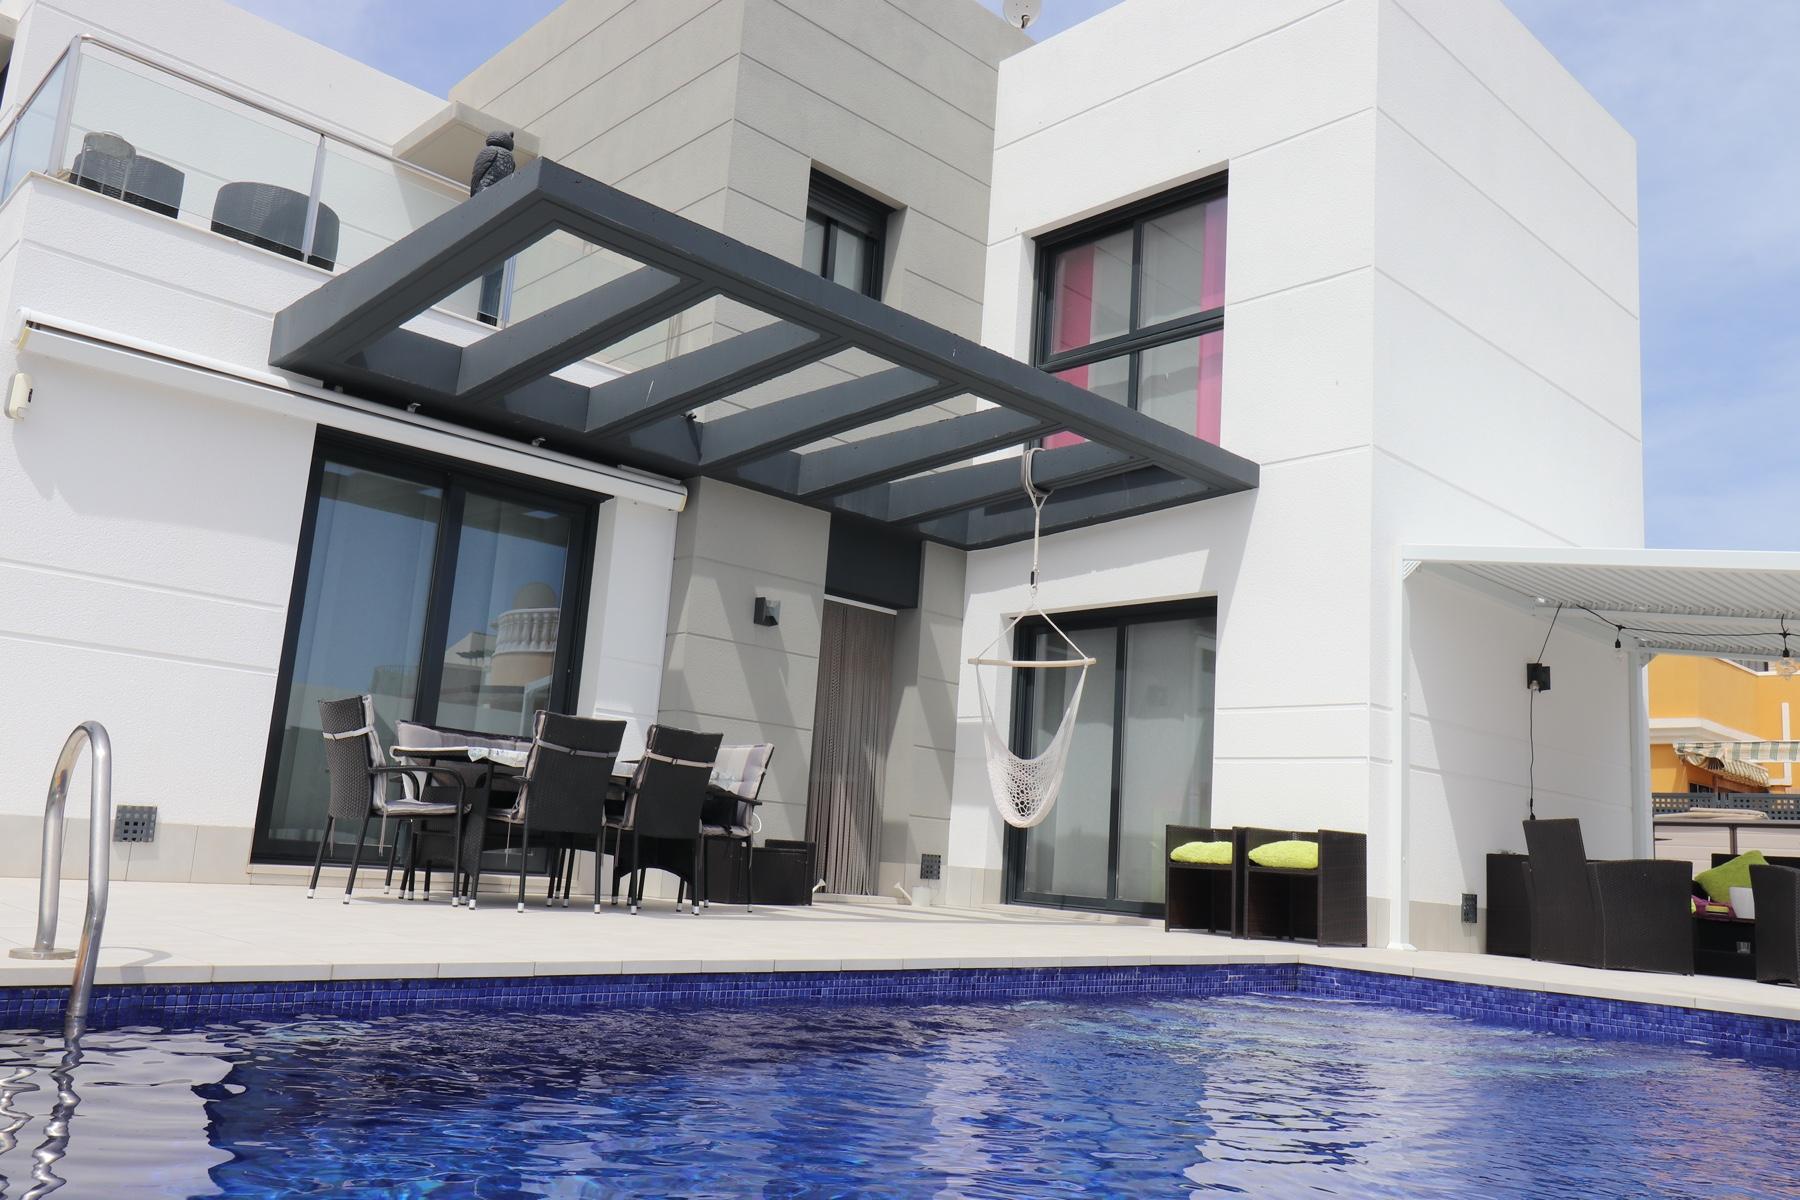 3 bedroom house / villa for sale in Guardamar del Segura, Costa Blanca